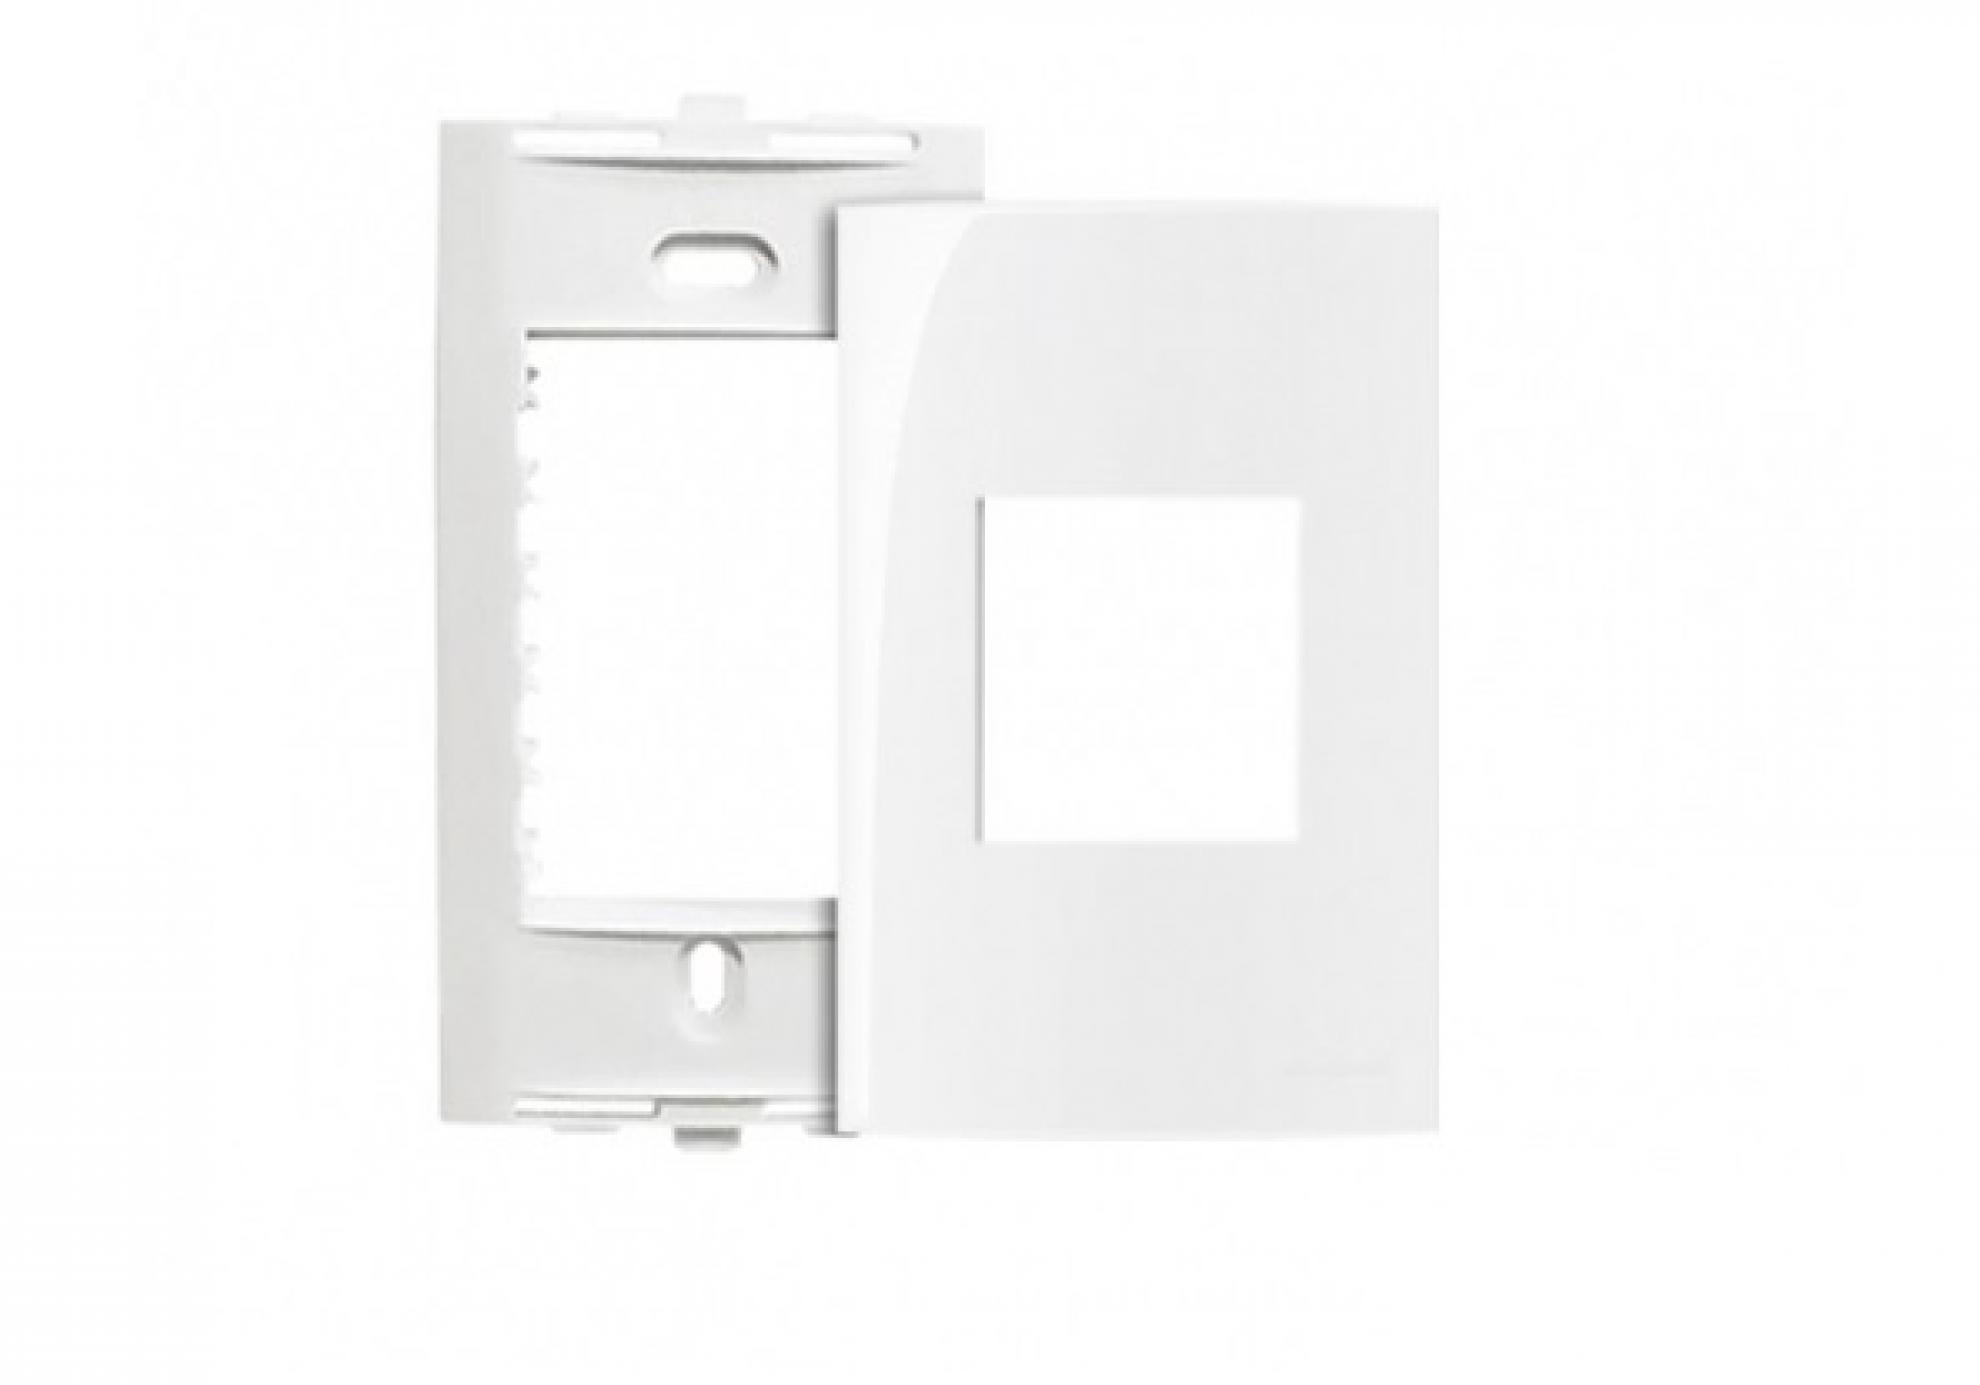 Placa 4X2 2Postos + Suporte -horizontal c/sp  Branco